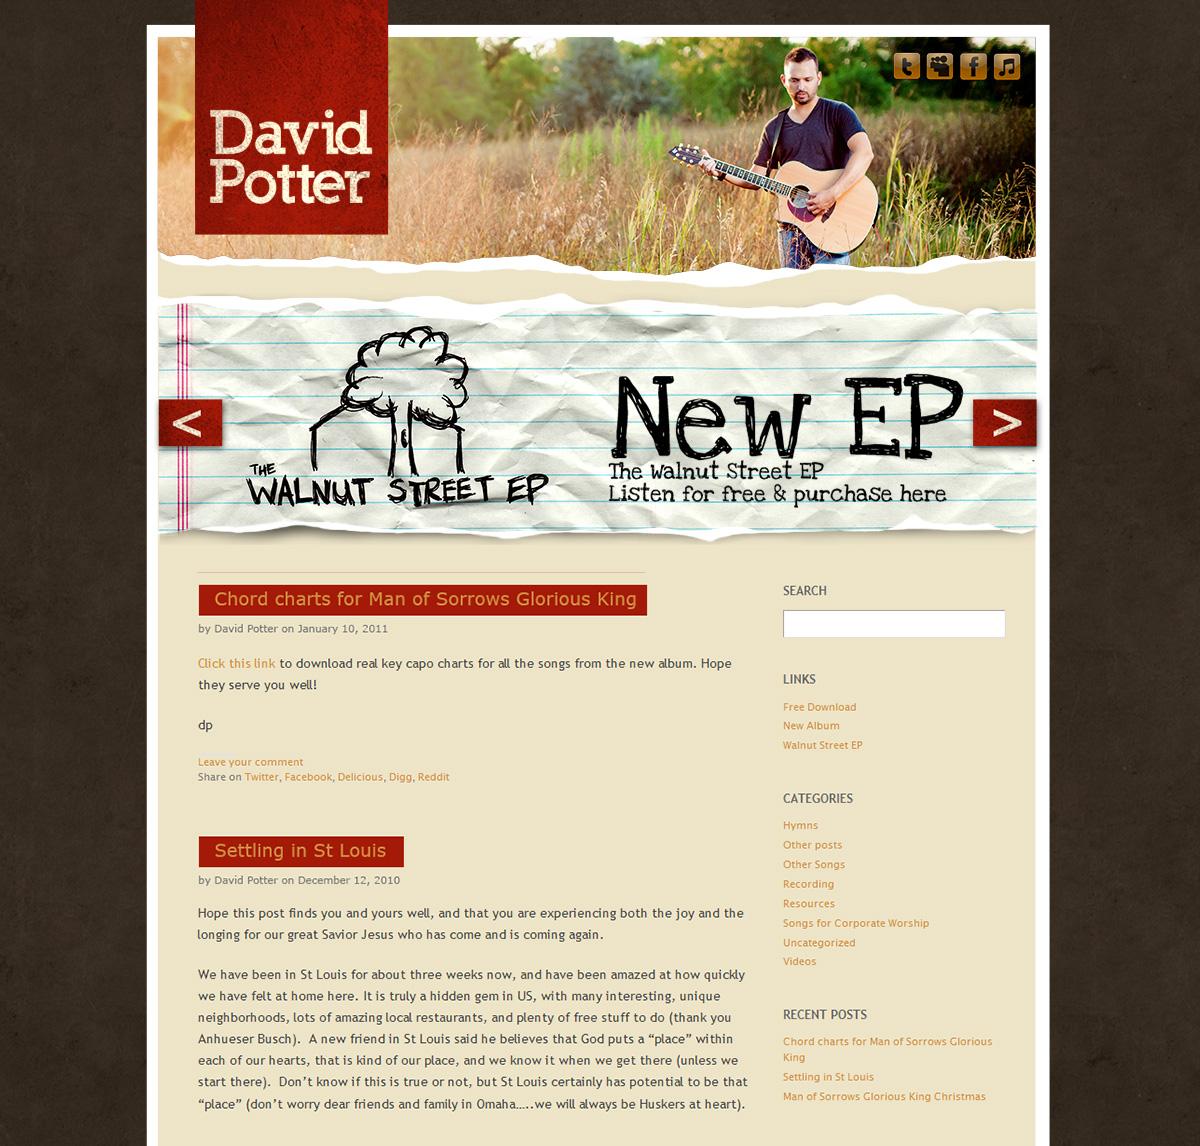 DavidPotter1